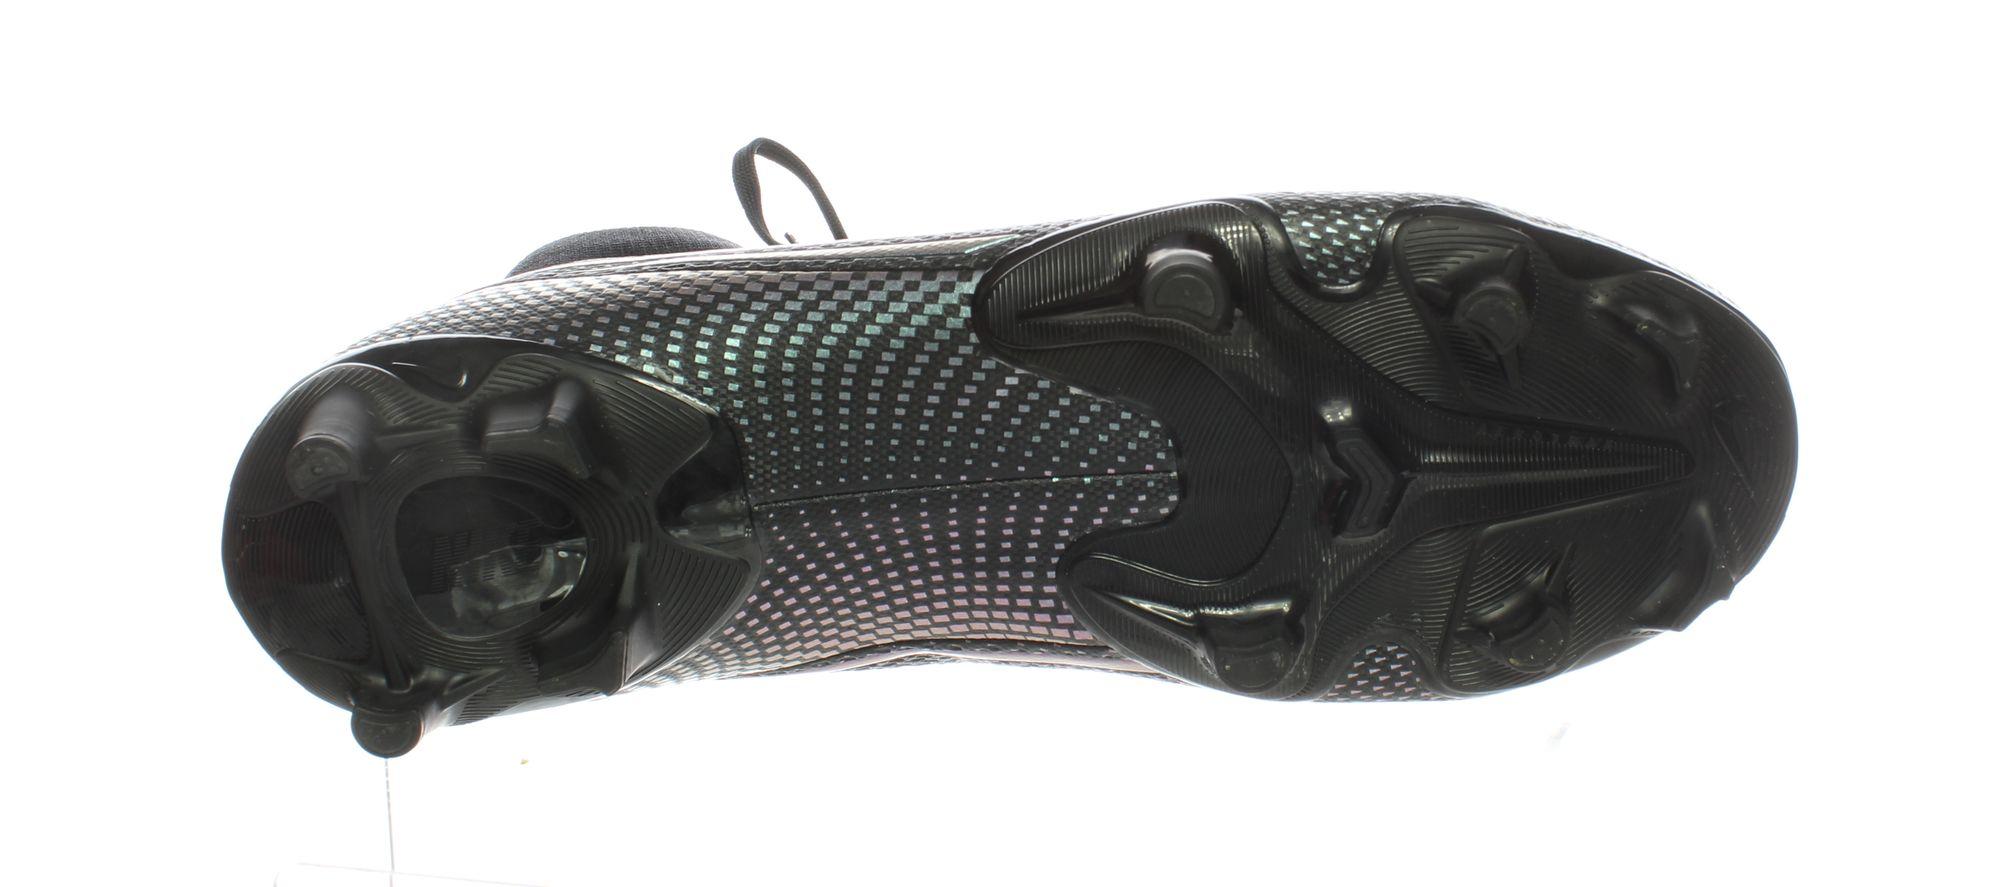 thumbnail 4 - Nike-Mens-Superfly-7-Academy-Fg-Mg-Black-Black-Football-Cleats-Size-11-1634335